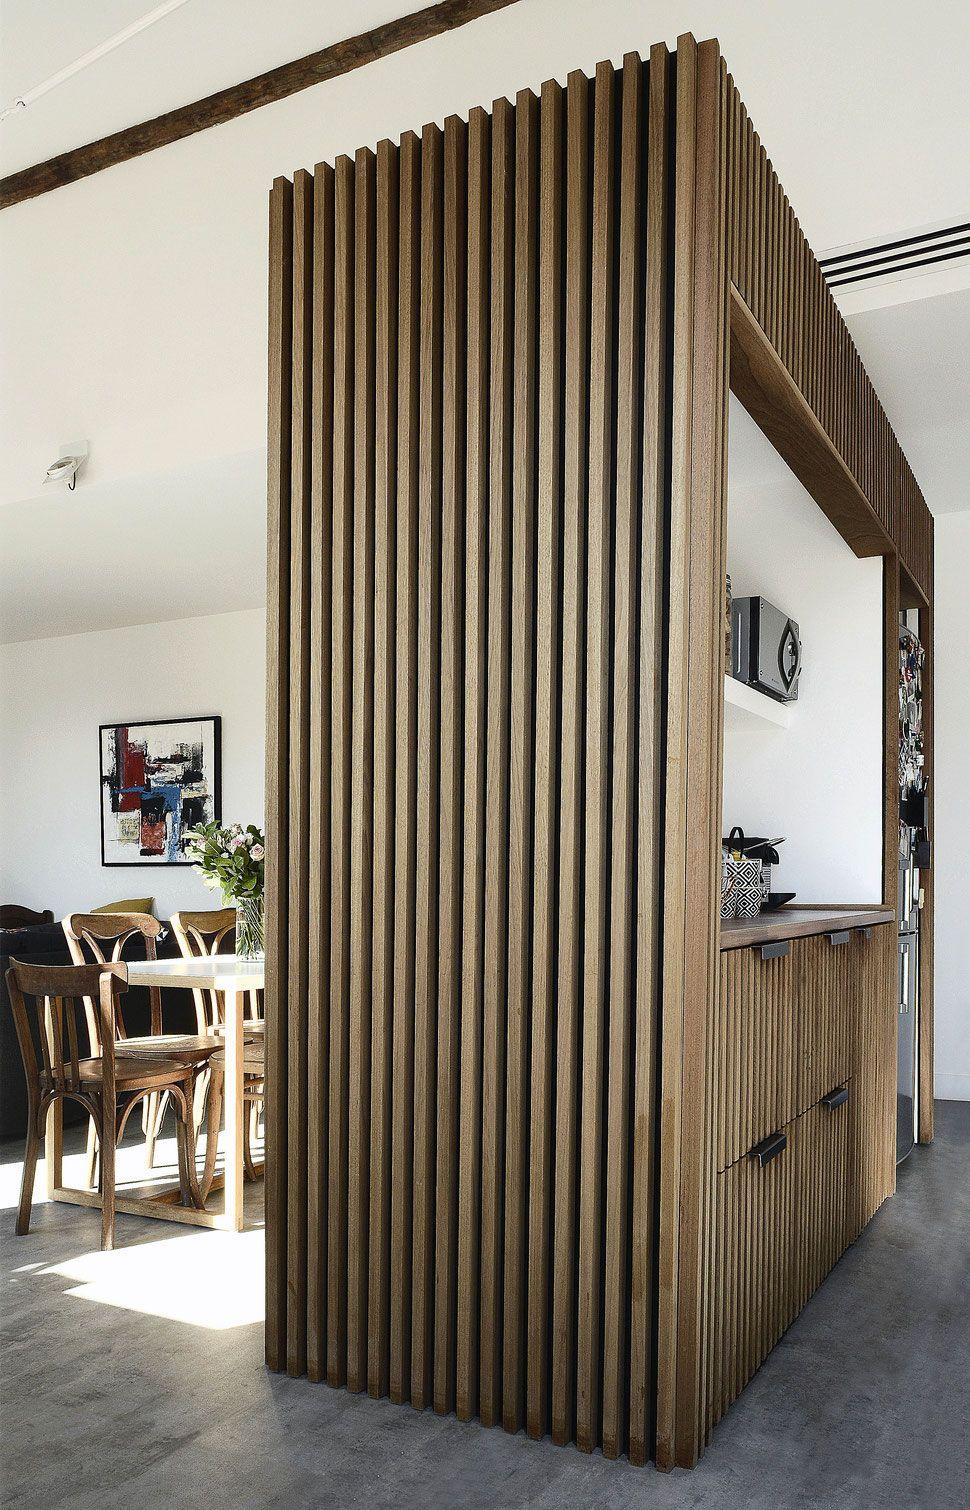 Bardage Bois Vertical Interieur bertrand guillon architecture - architecte - marseille